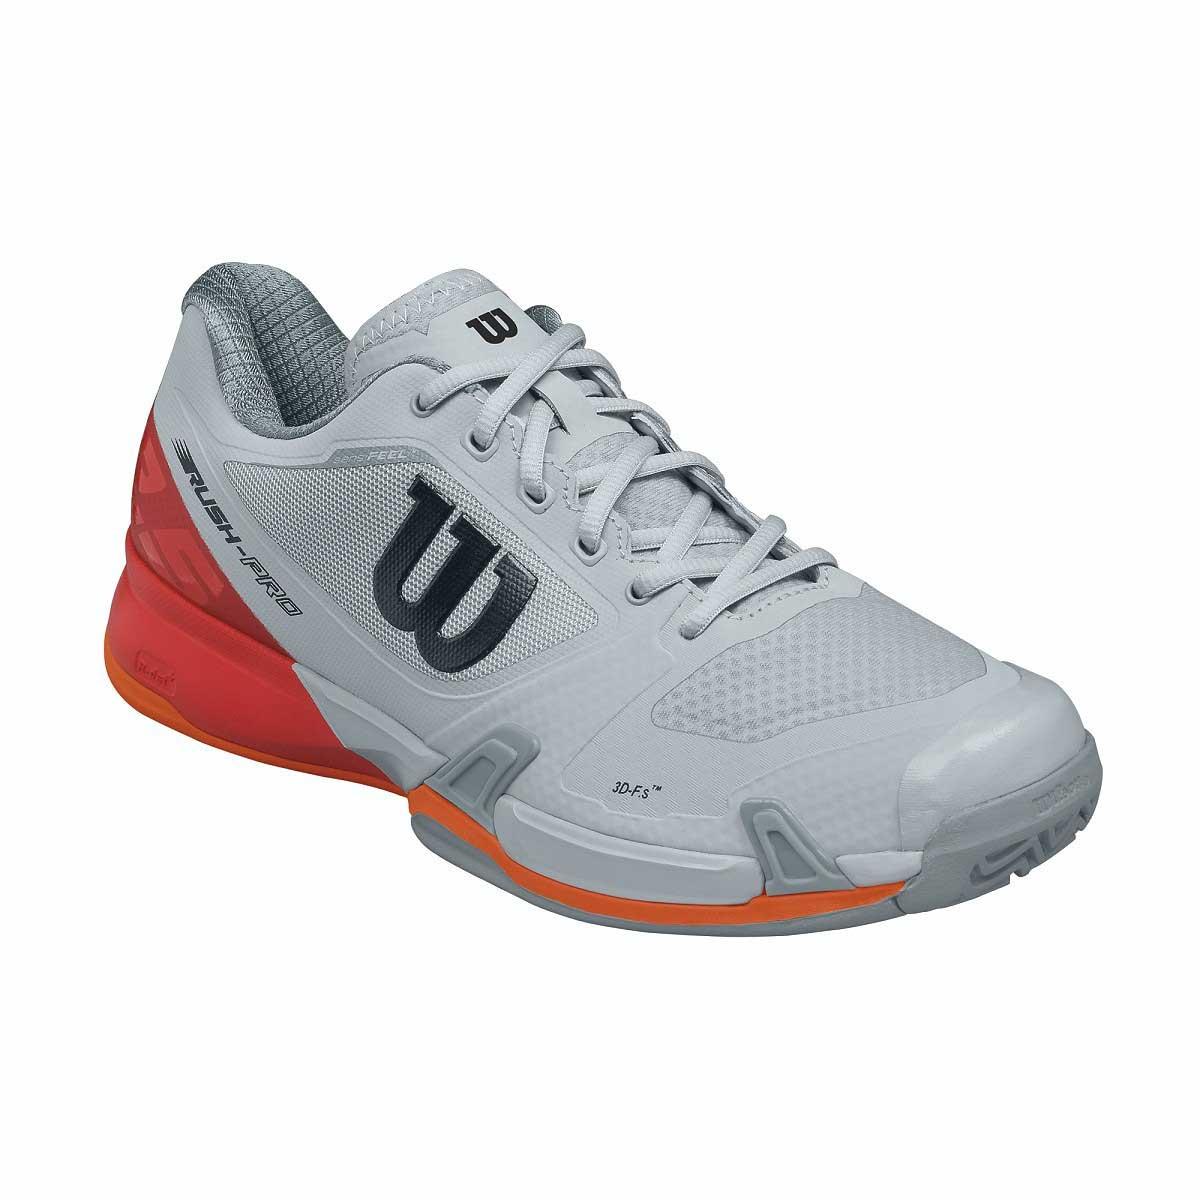 11888ba1a016 Buy Wilson Rush Pro 2.5 Tennis Shoes (Pearl Blue Fiery Red) Online